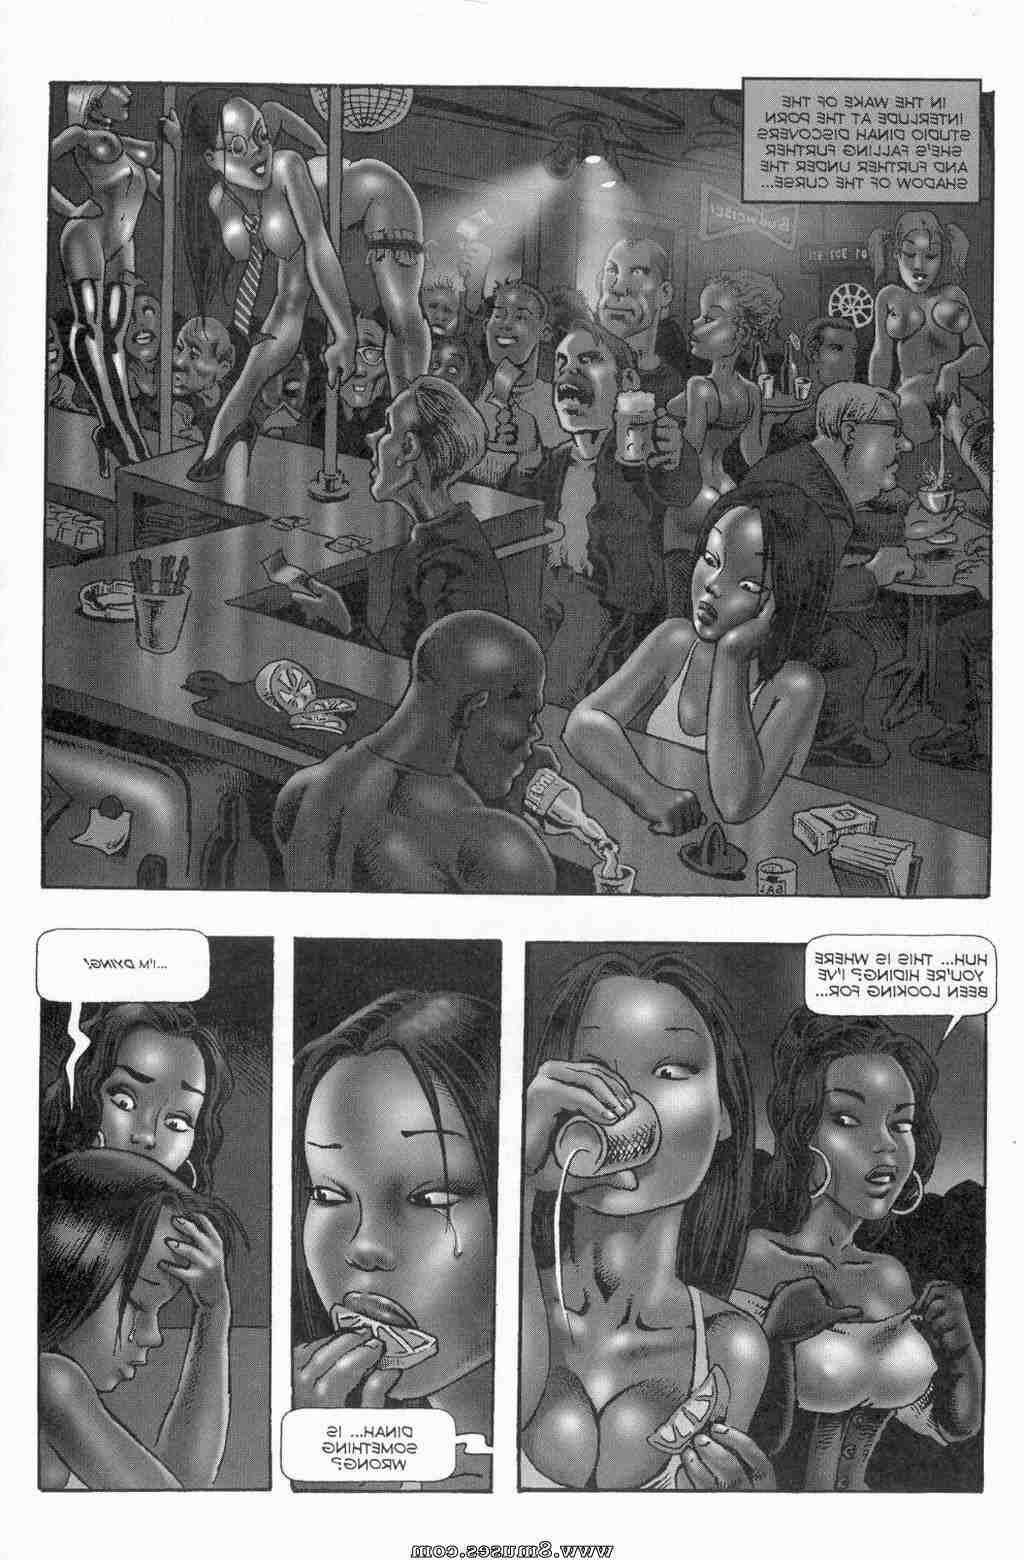 EROS-Comics/Alraune/Alraune-06 Alraune_06__8muses_-_Sex_and_Porn_Comics_3.jpg